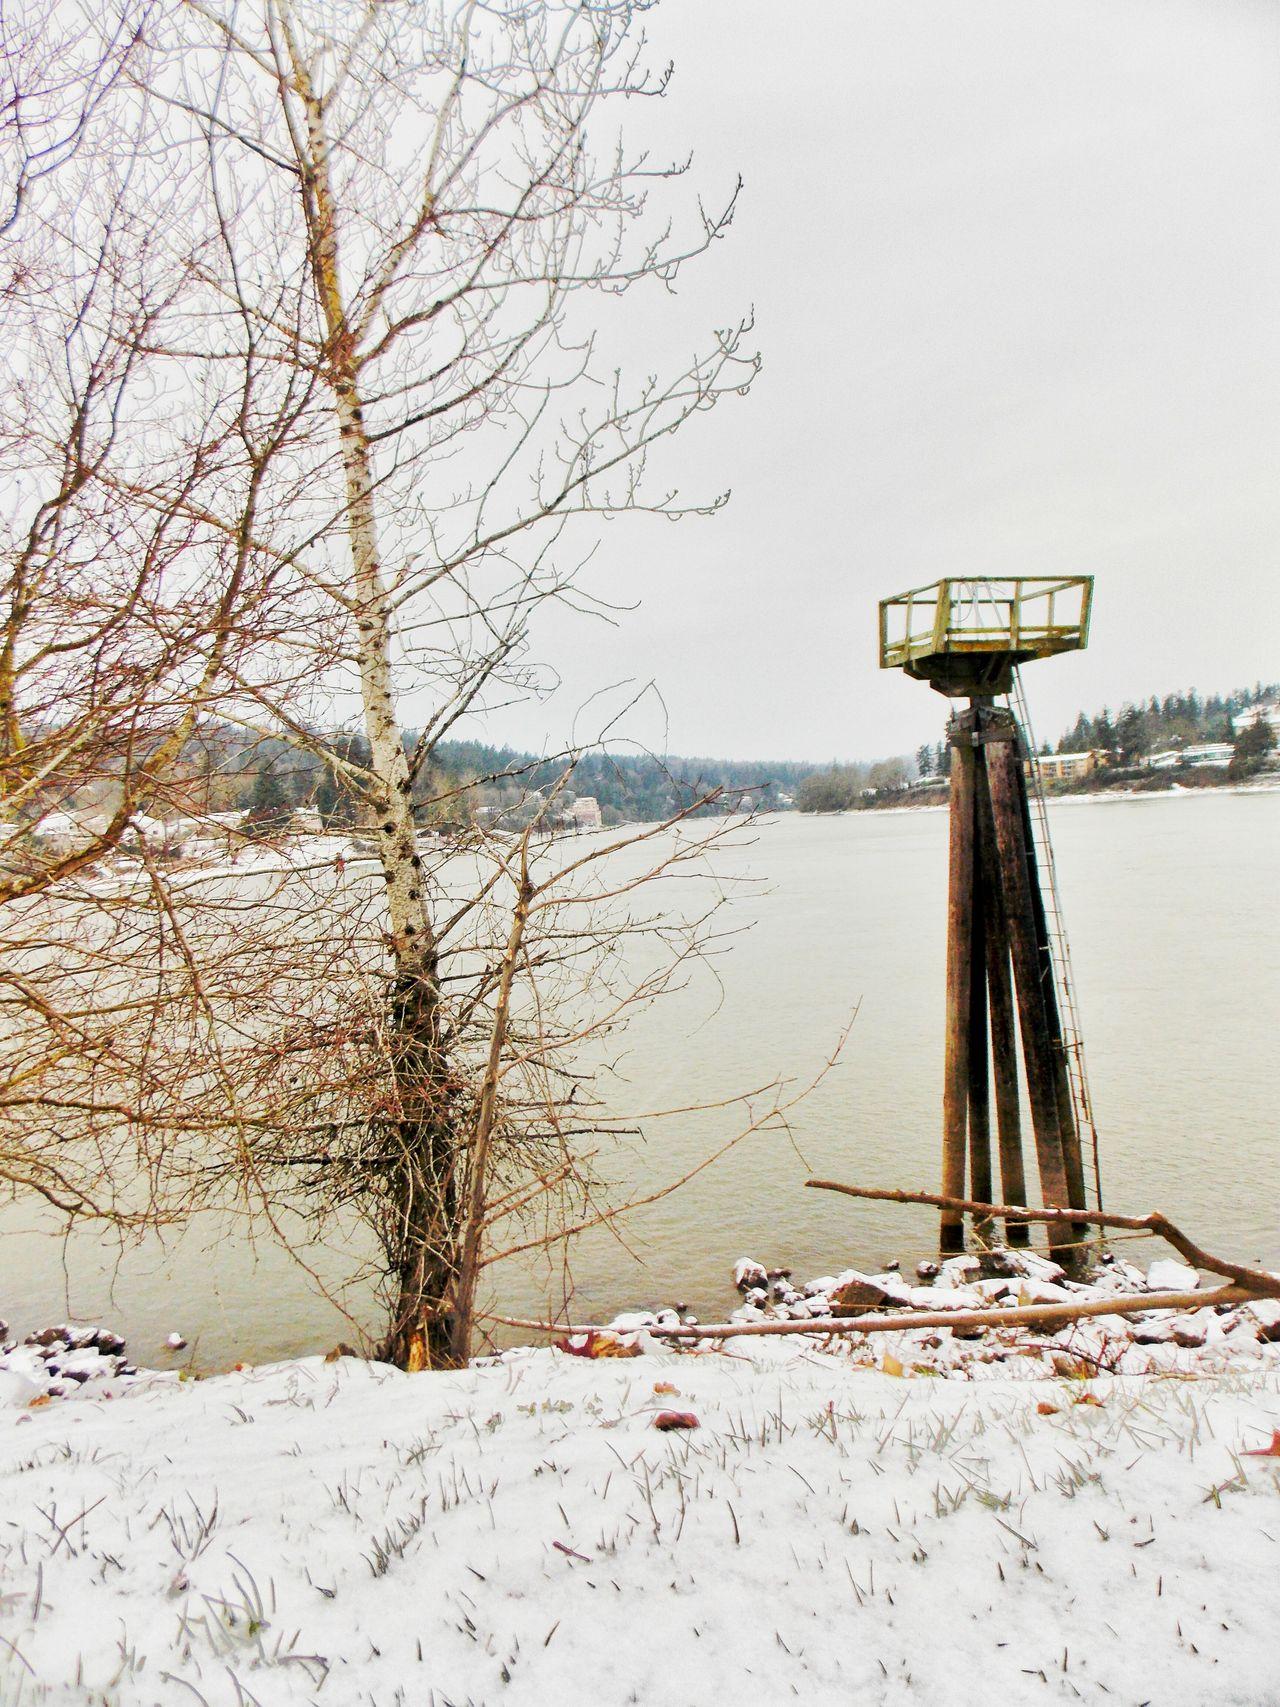 Taking Photos Watch Tower Milwaukie OR. Clackamas River Enjoying Life Snow ❄